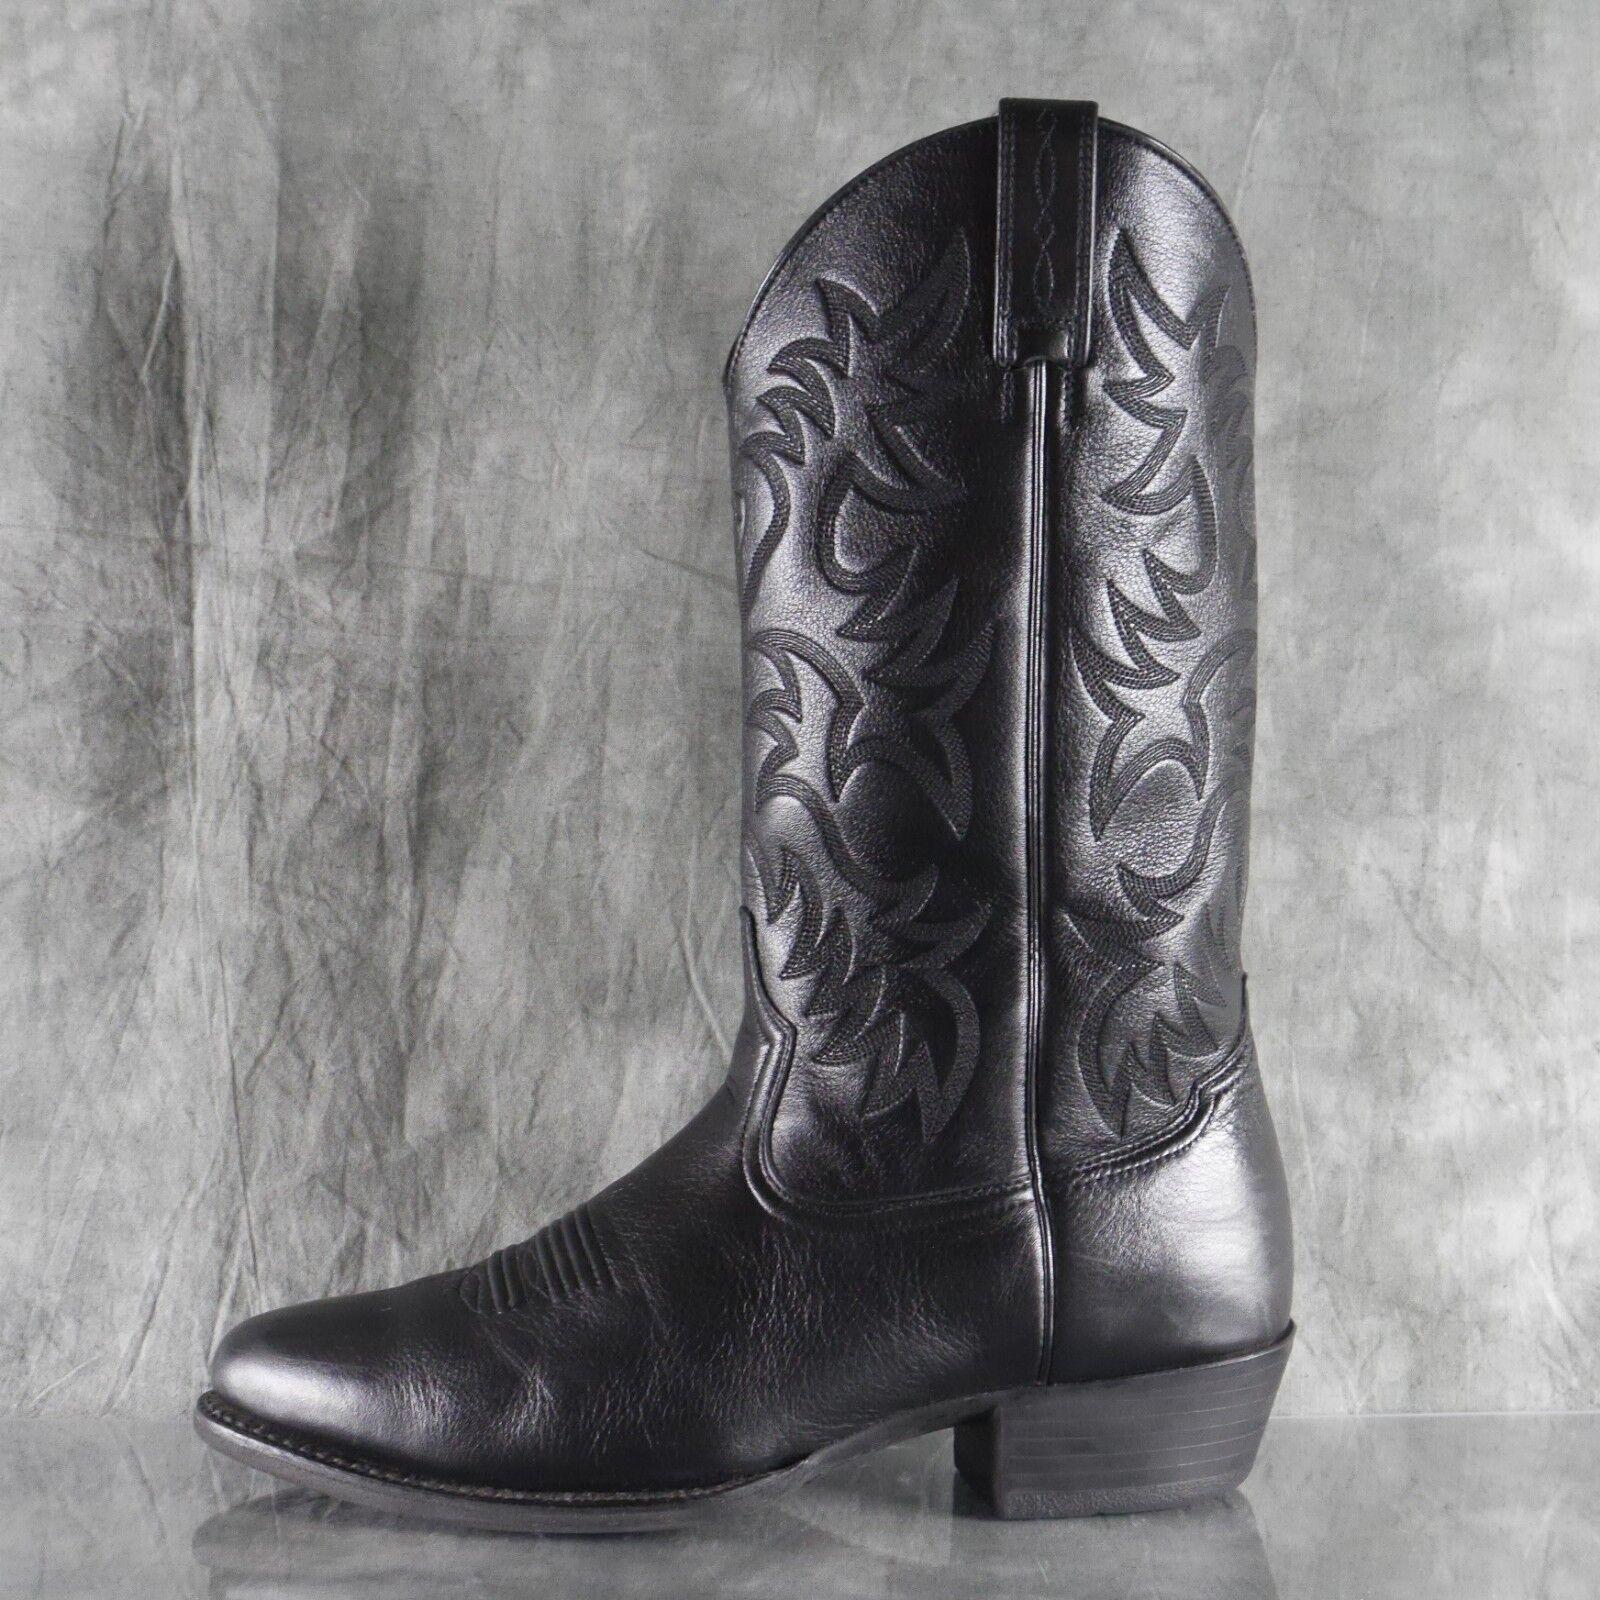 NEUF sans boîte Ariat Heritage R Toe en cuir noir western cowboy bottes homme taille 11EE ANB